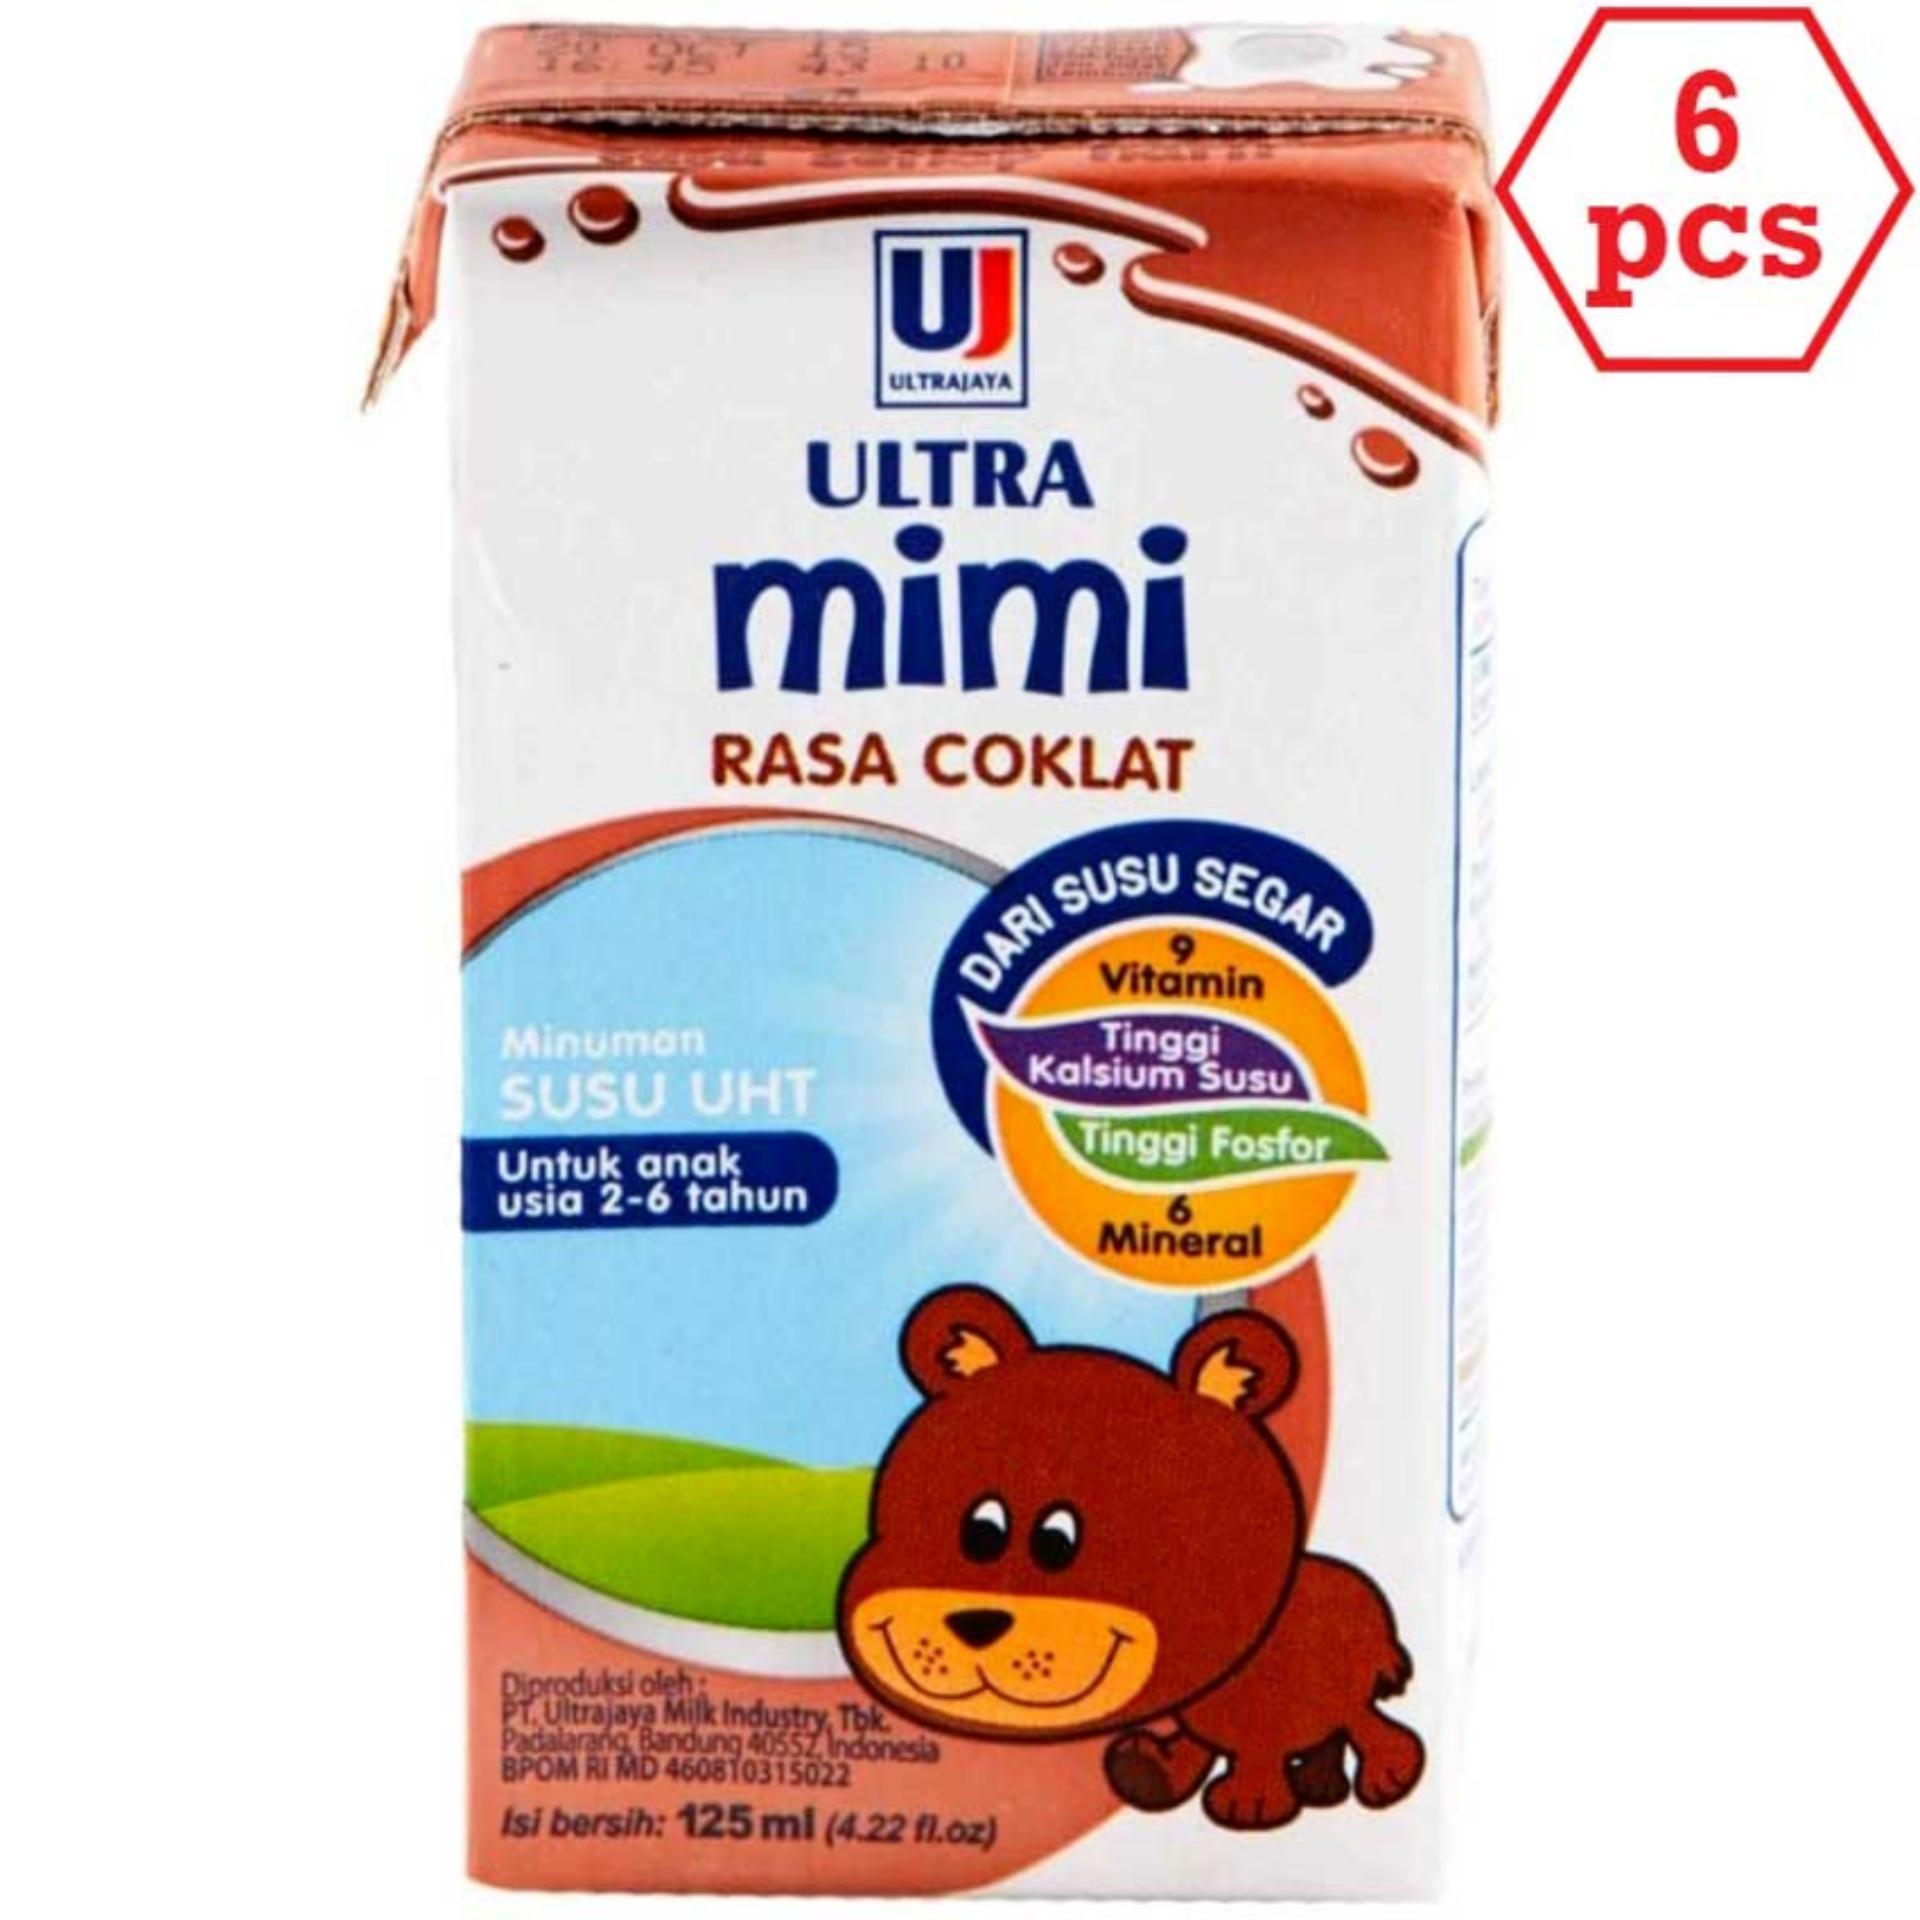 ULTRA mimi Susu UHT Cokelat 125ml 6pcs